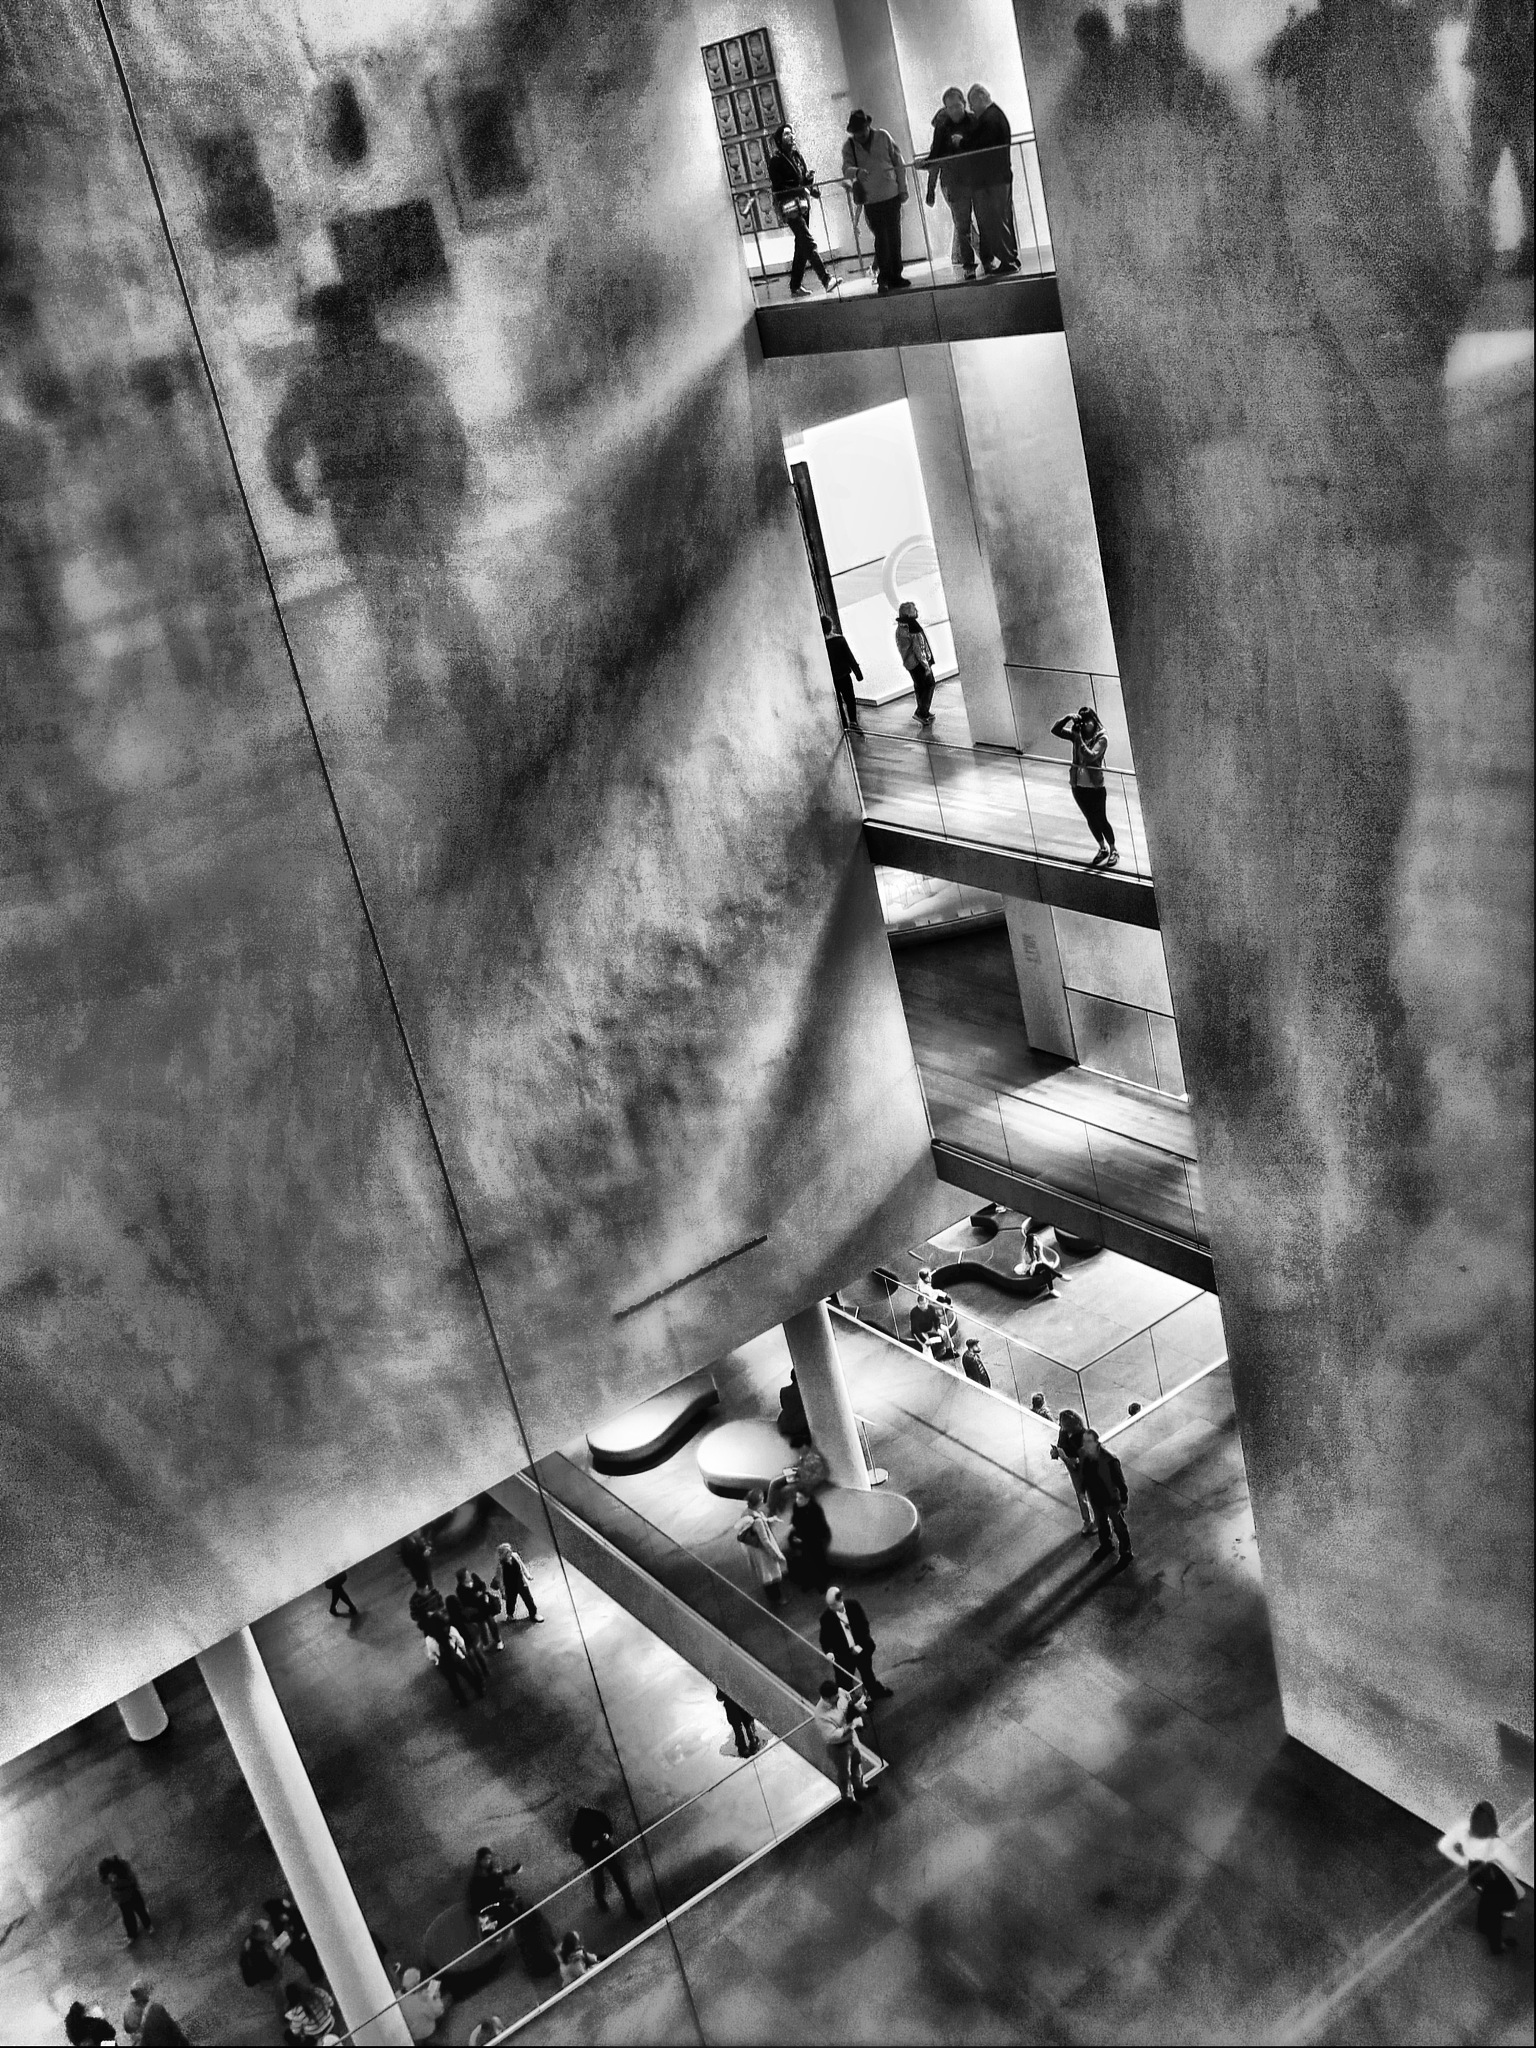 MOMA: Shadows on the wall by mariovar